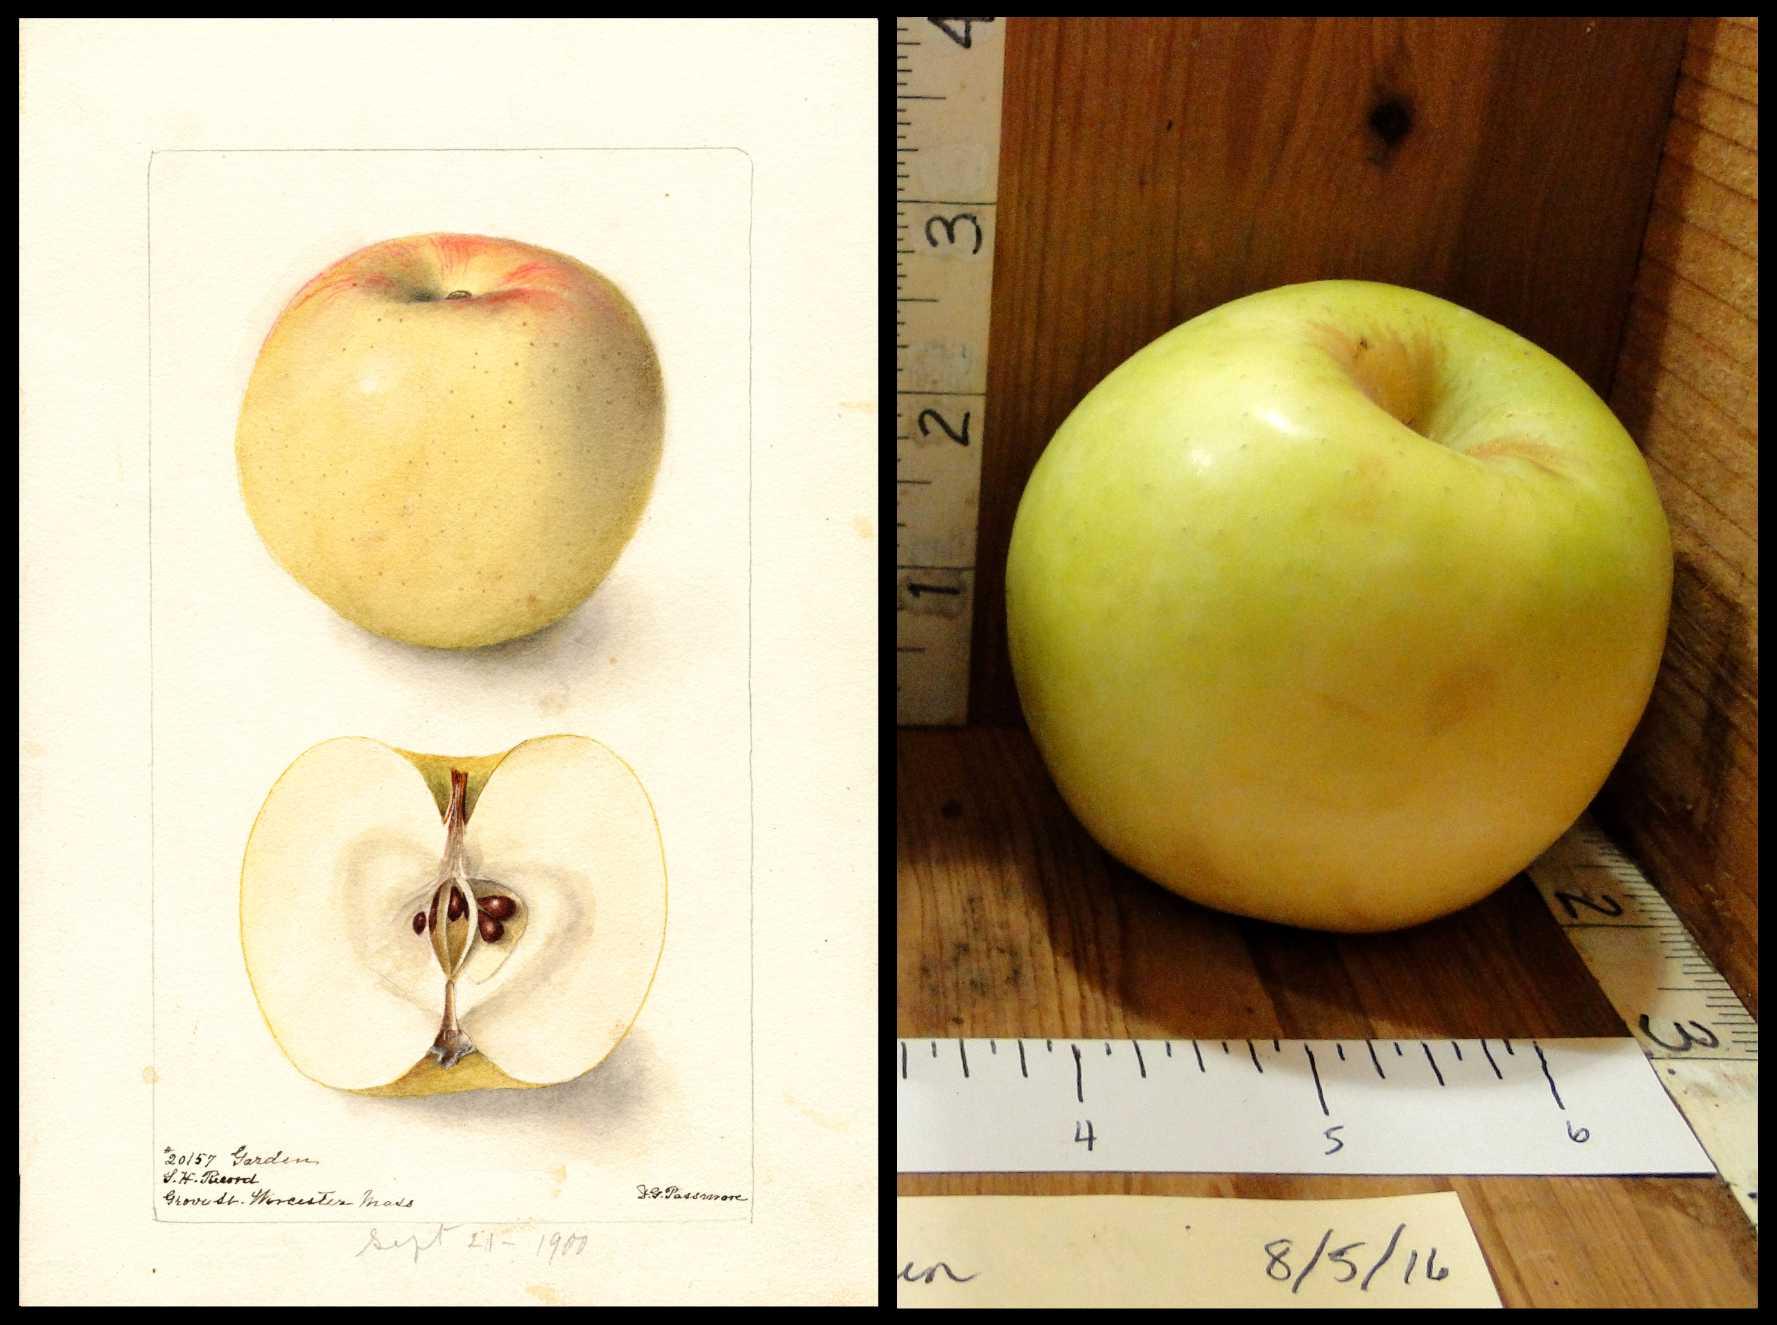 light greenish yellow apple